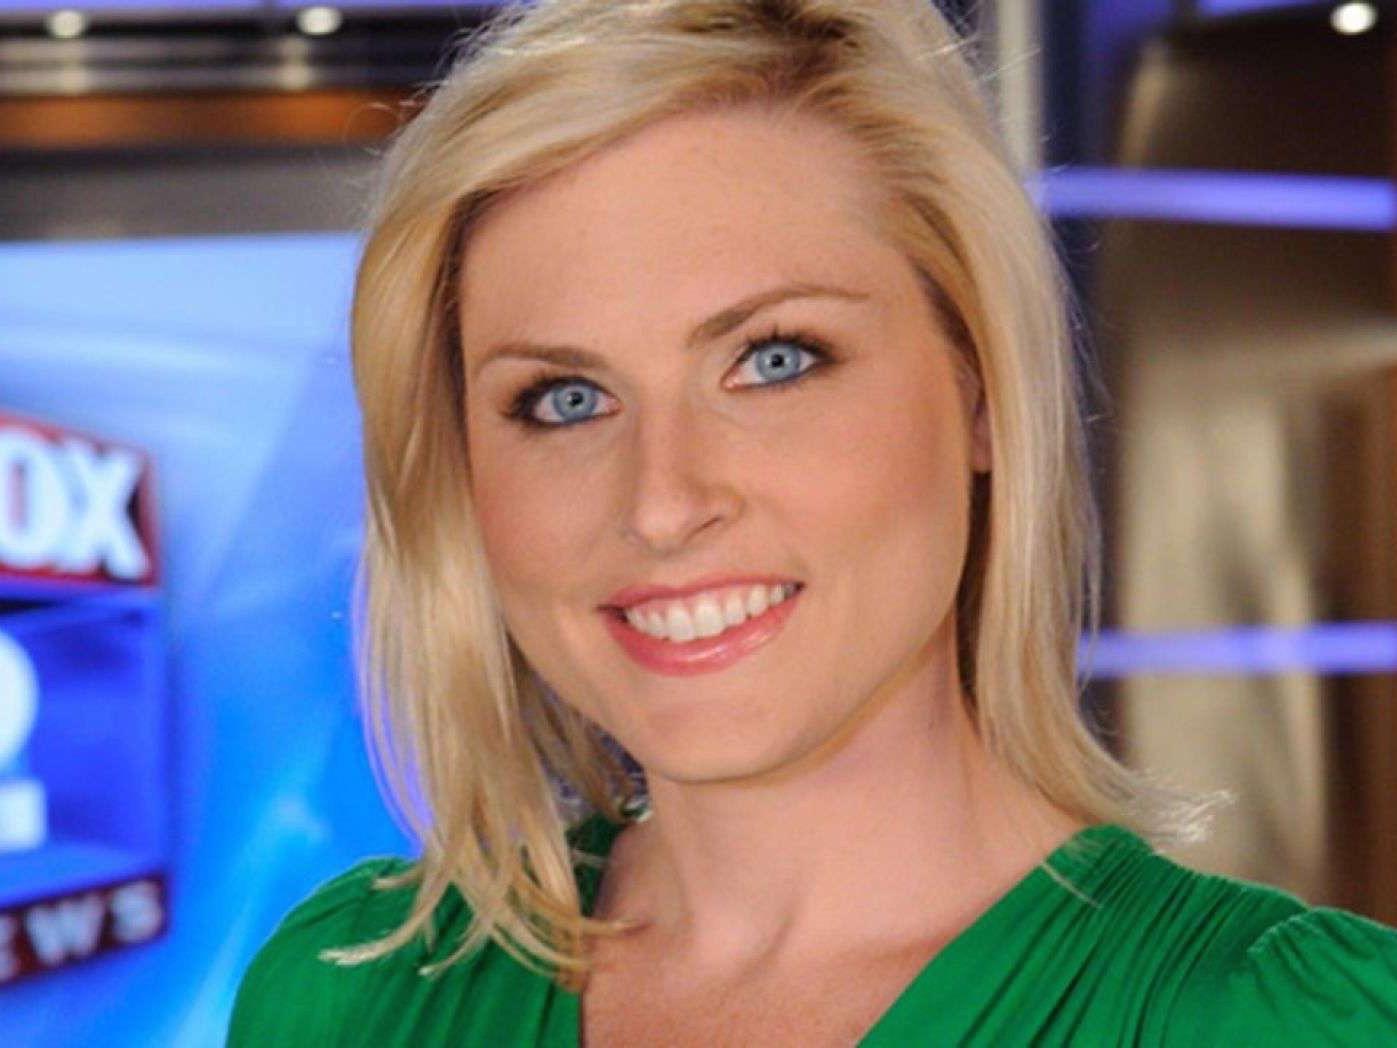 Fox 2 Meteorologist Jessica Starr Dies by Suicide